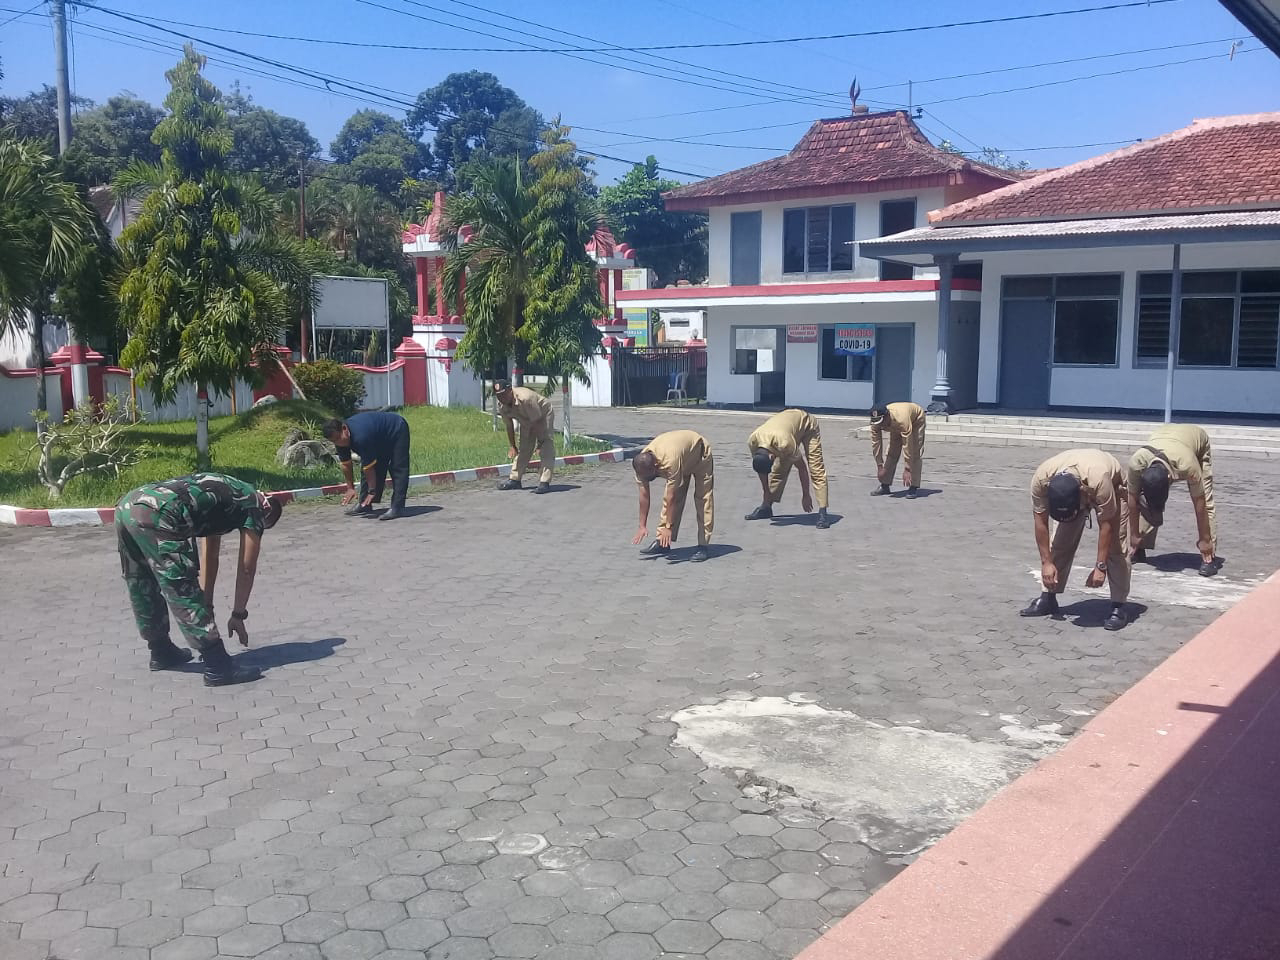 Antisipasi Covid-19, Babinsa Desa Jombang Rutin Olah Raga Bersama Perangkat Desa